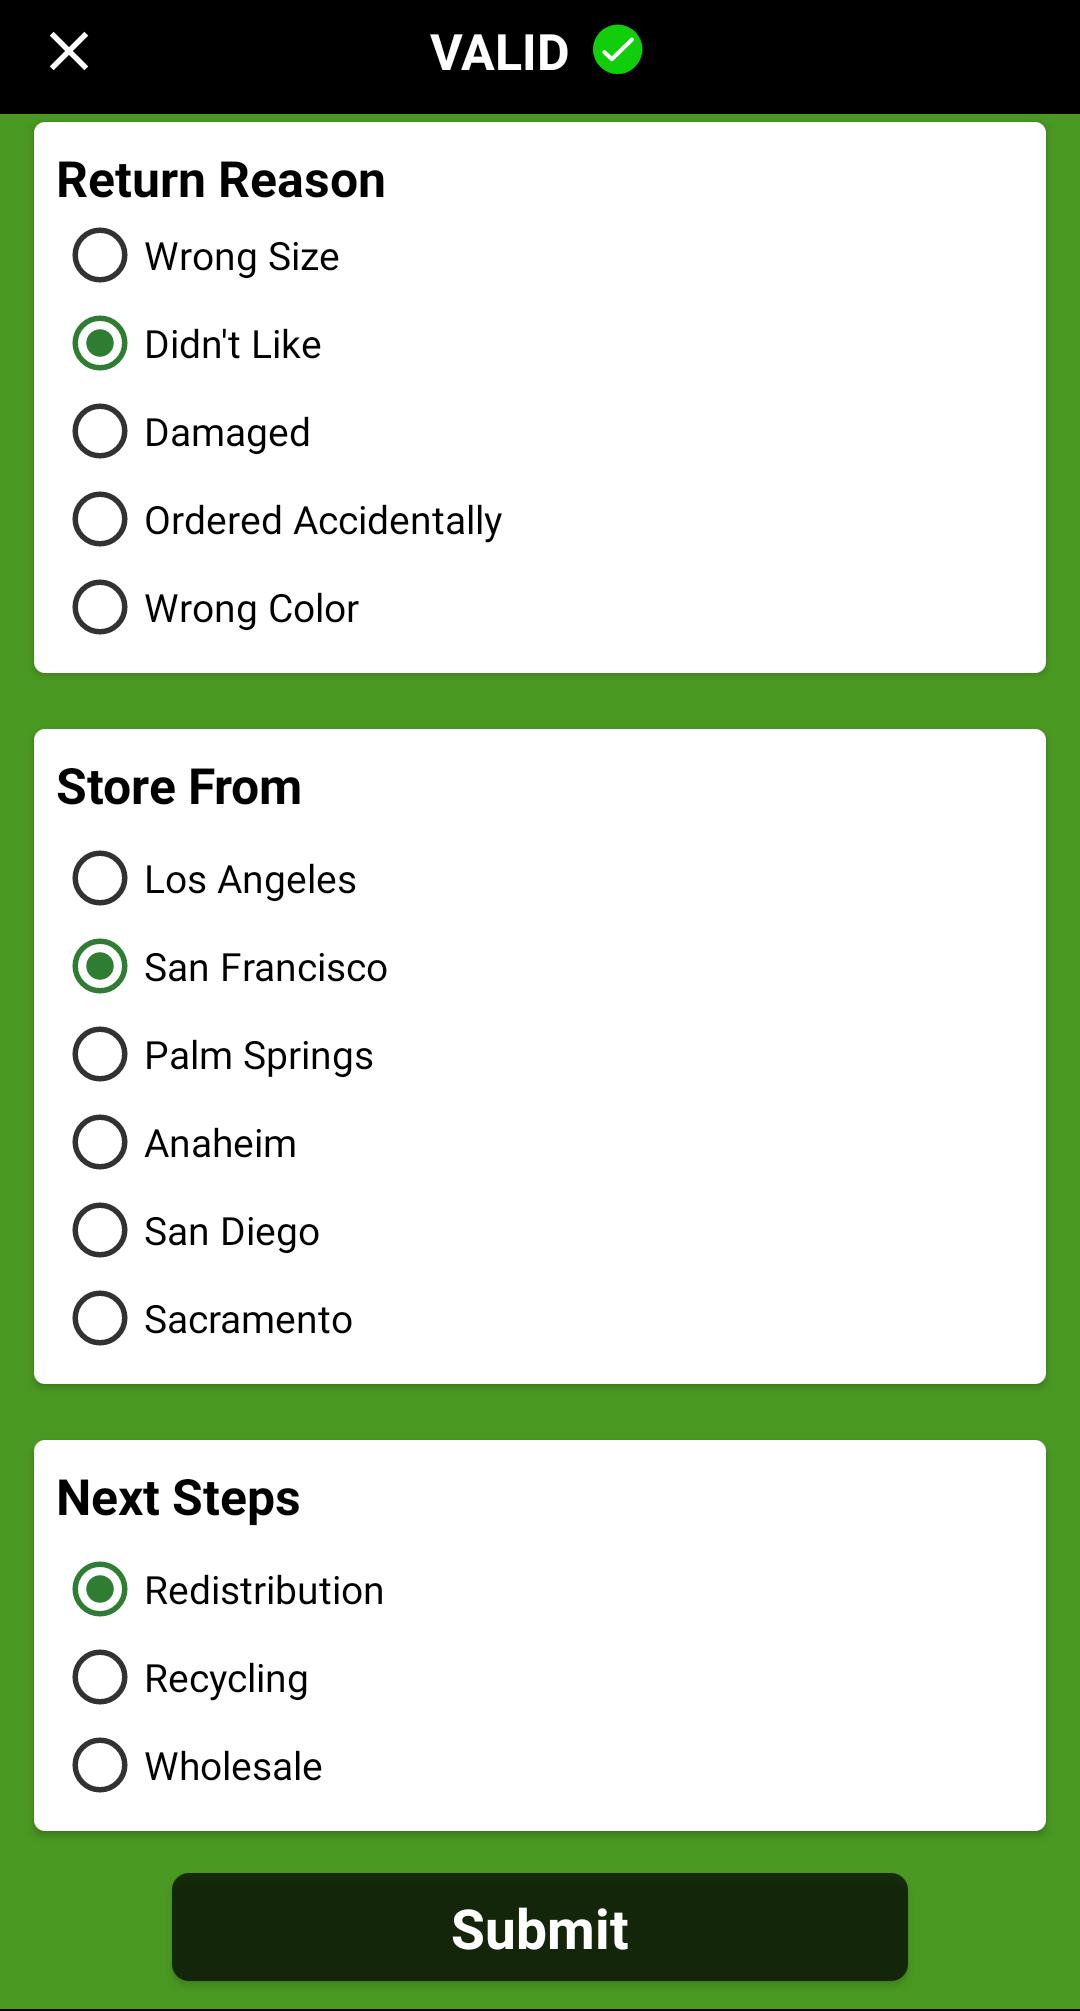 Returning an Item Via Barcode